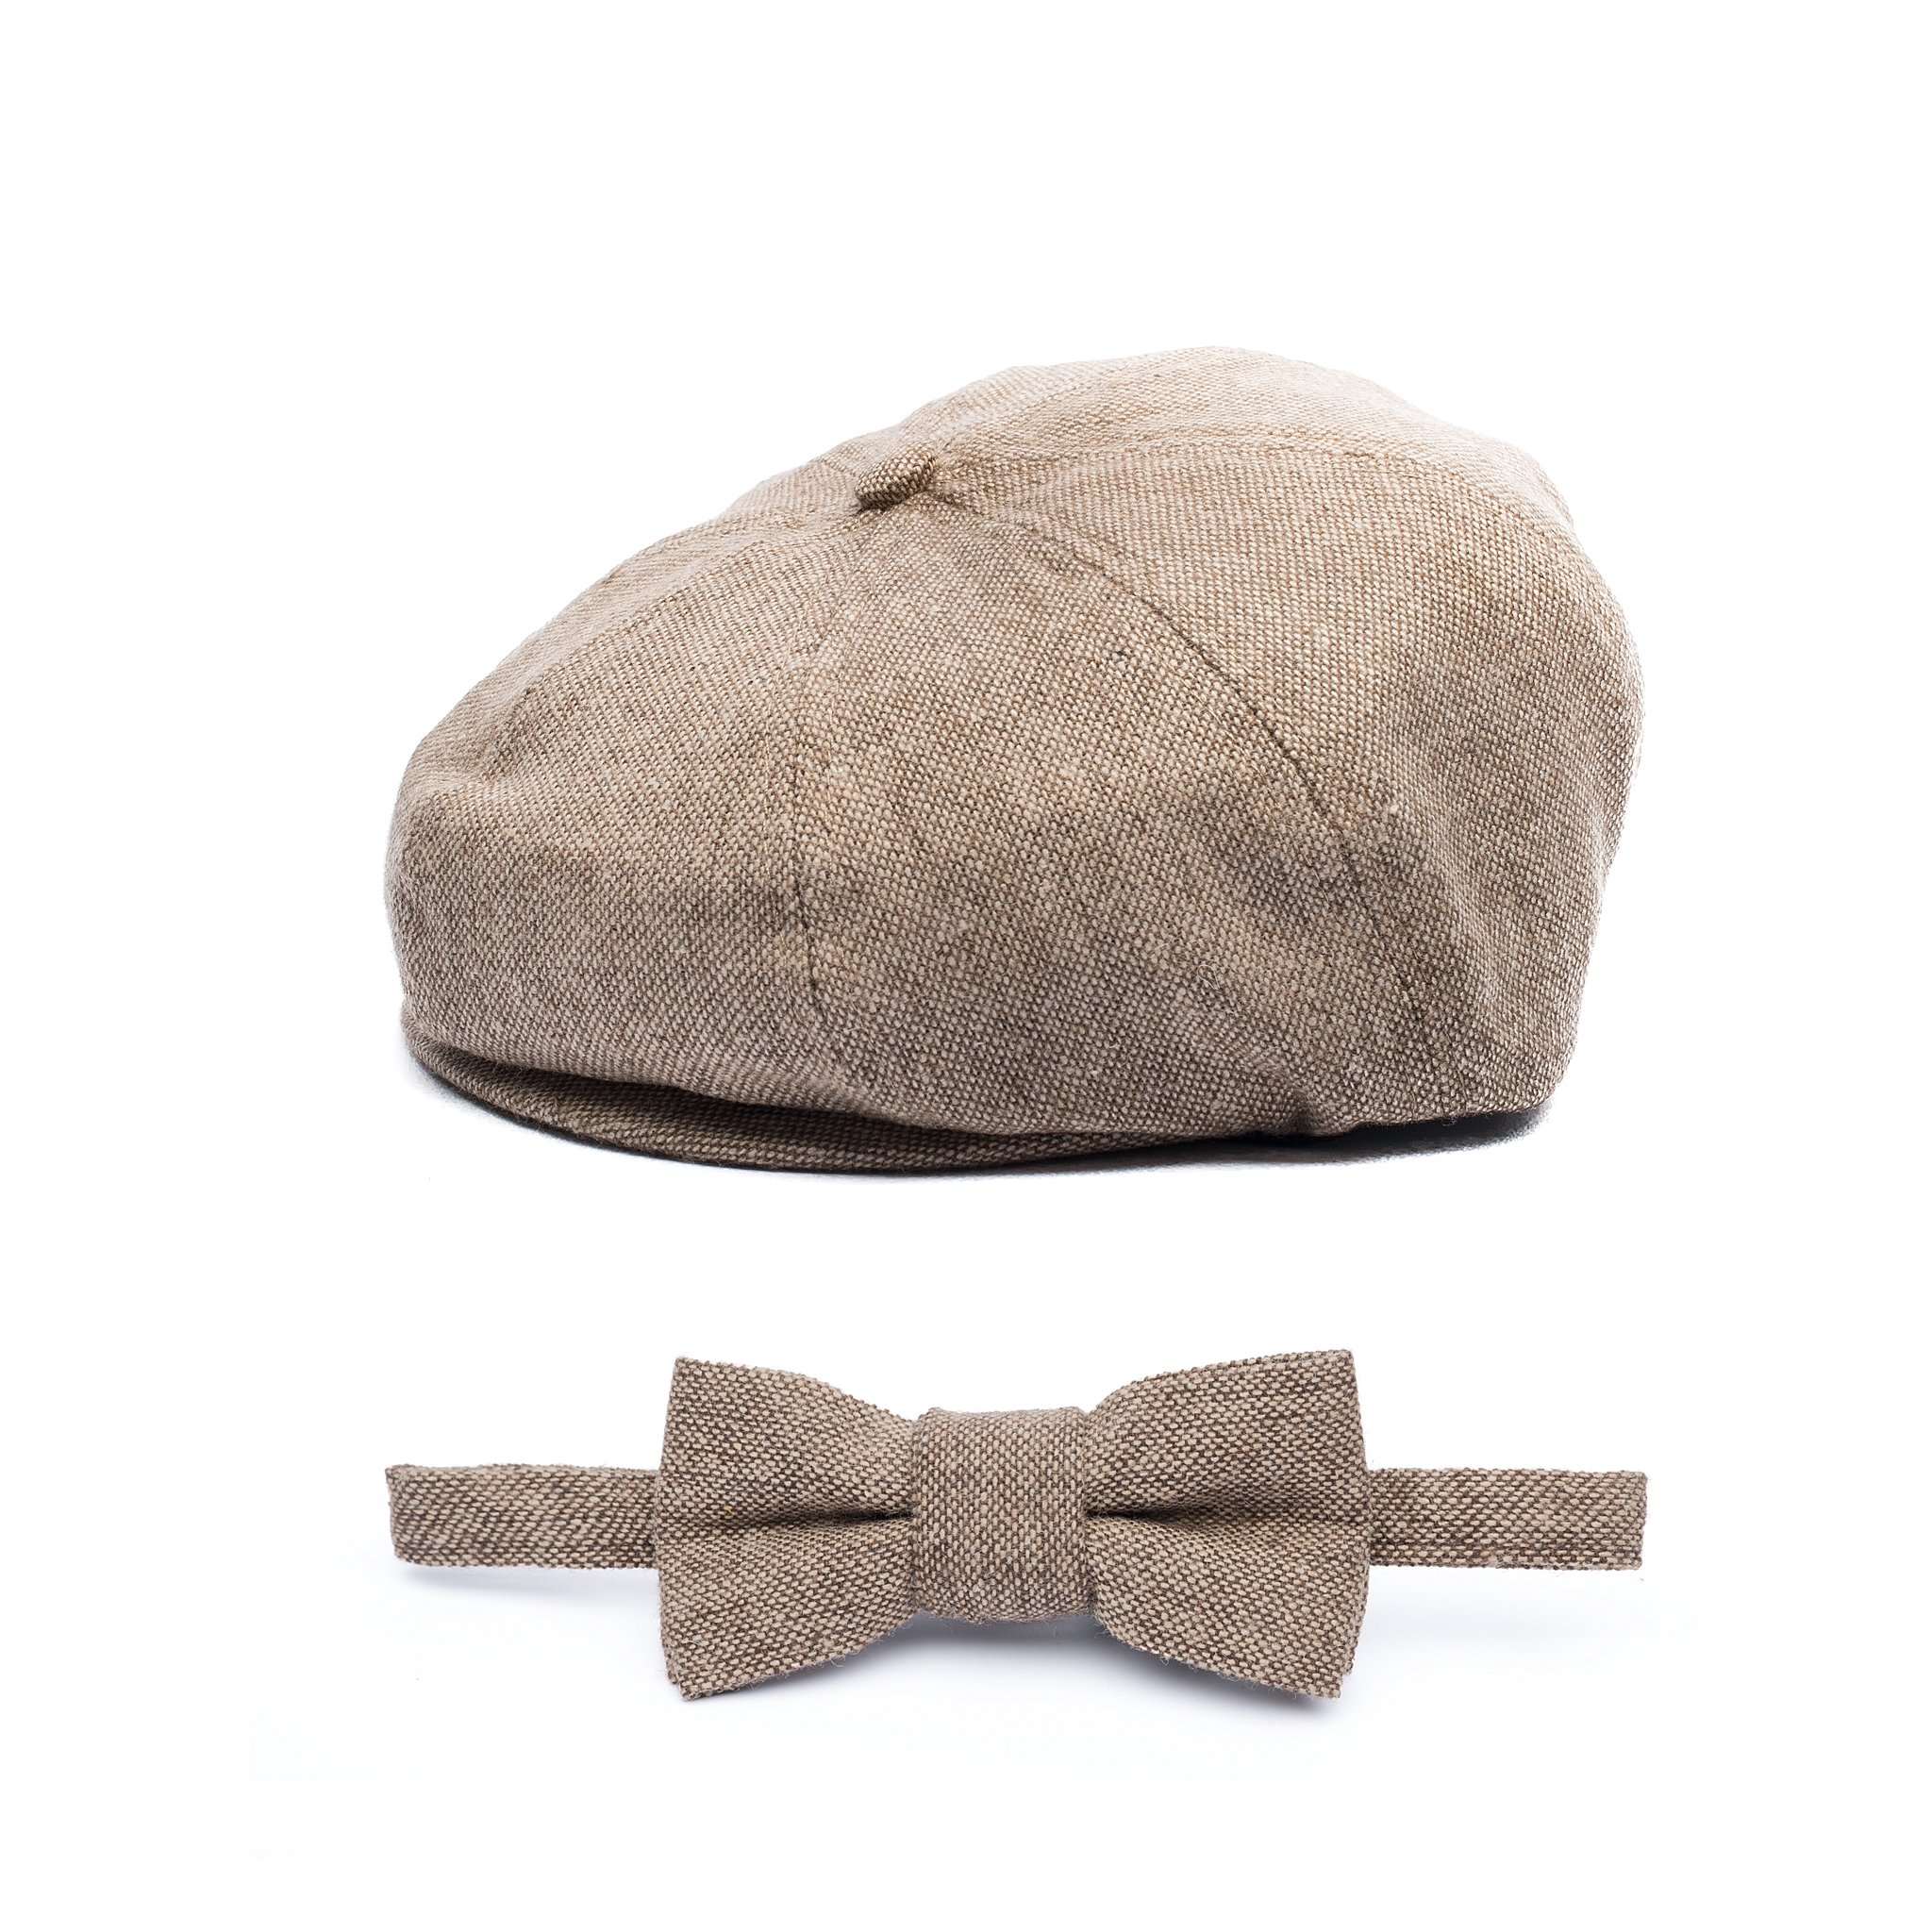 Baby Boy Ring Bearer Pageboy Flat Ivy Newsboy Tweed Golf Cap Hat -(XXS 46 cm)